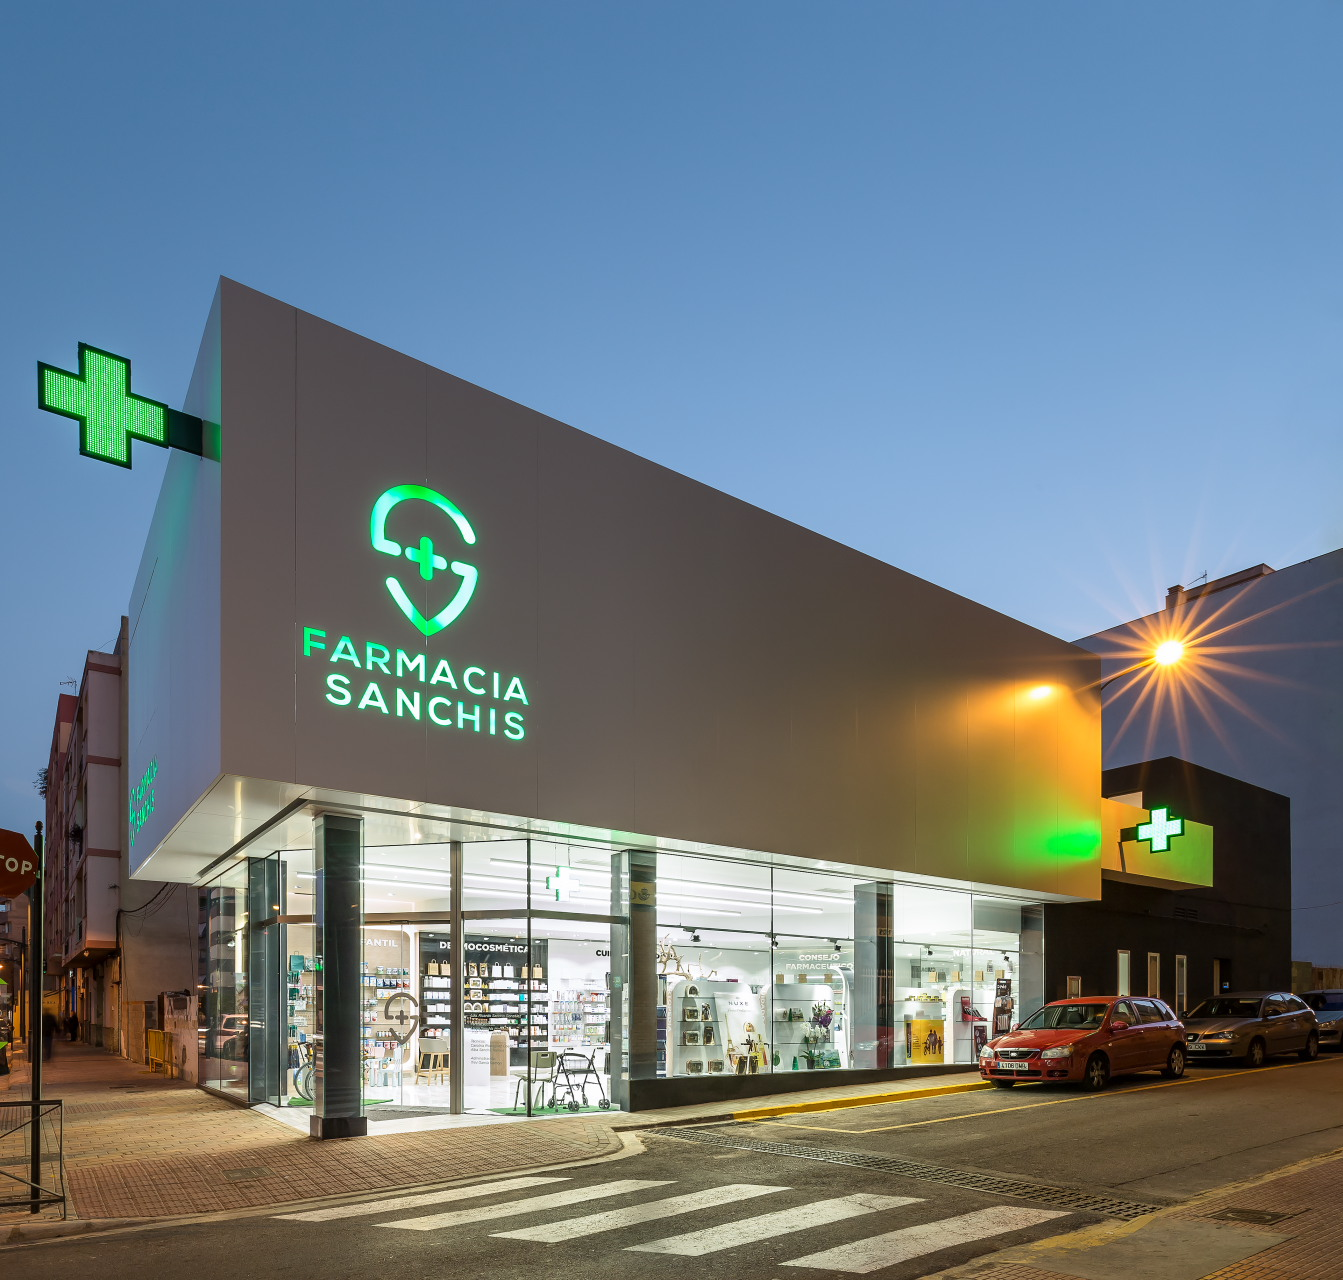 fotografia-arquitectura-valencia-german-cabo-d'estudio-farmacia-sanchis-ribarroja (34)